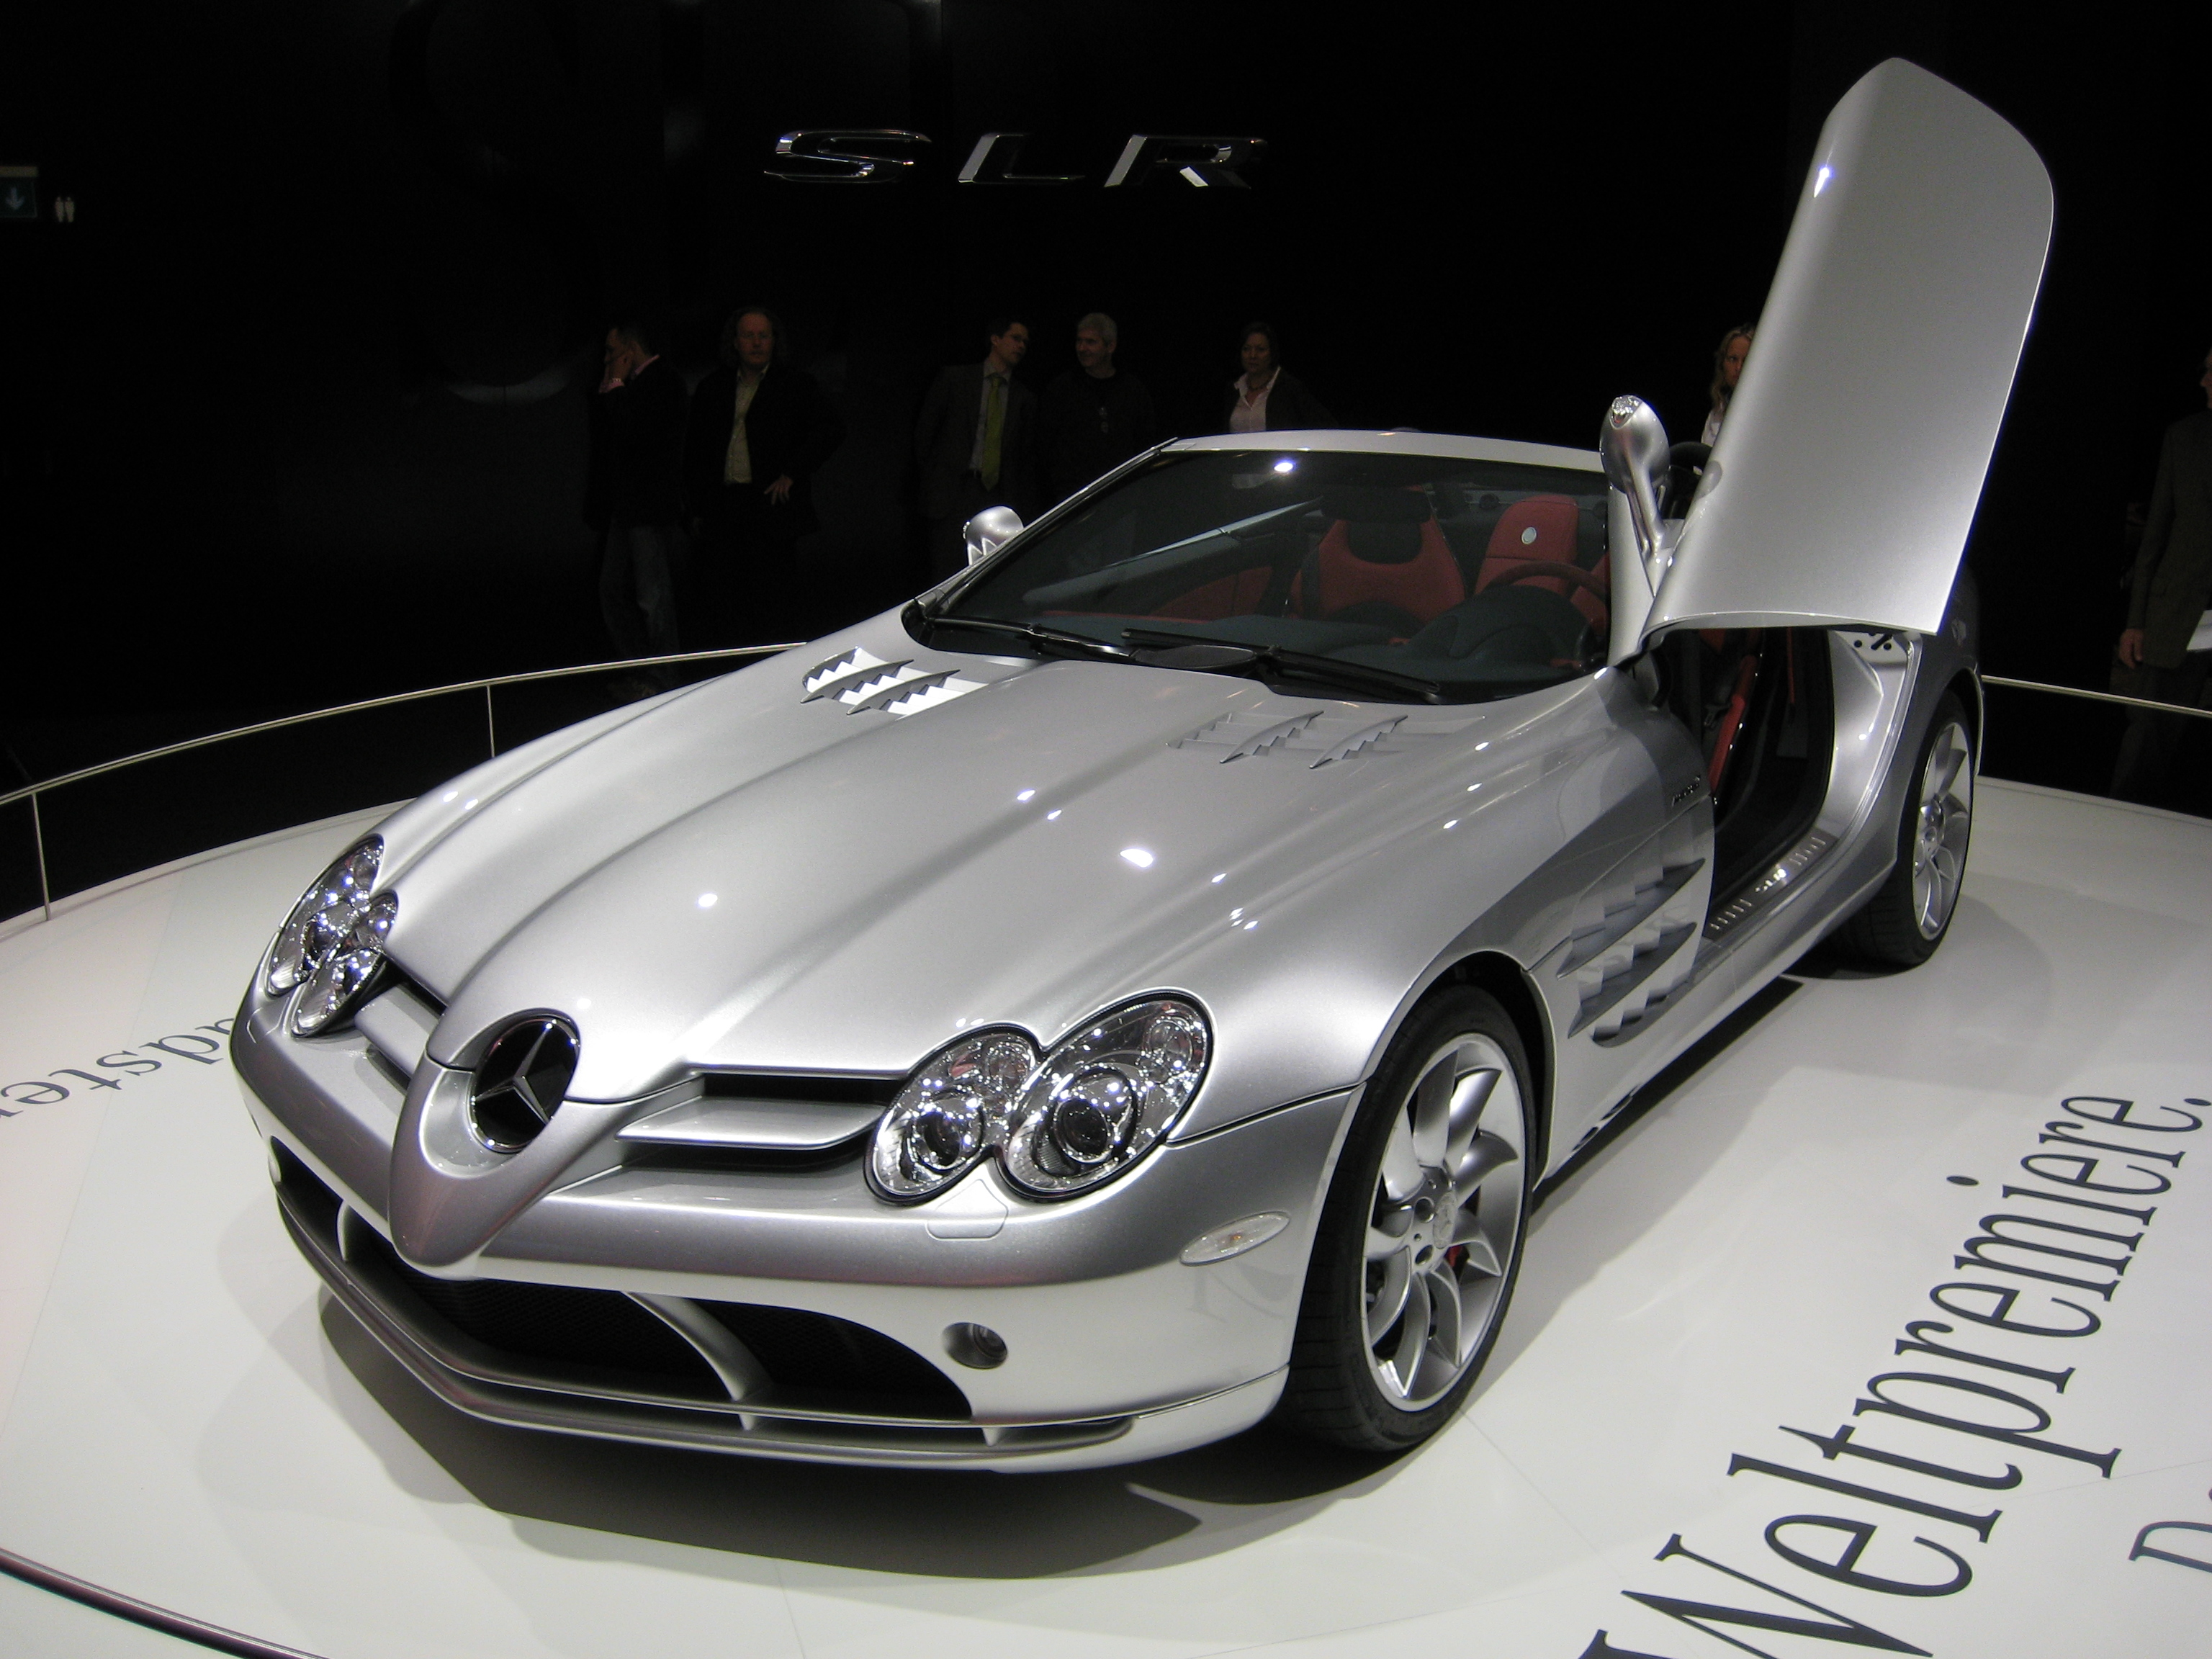 Mercedes benz slr mclaren фото